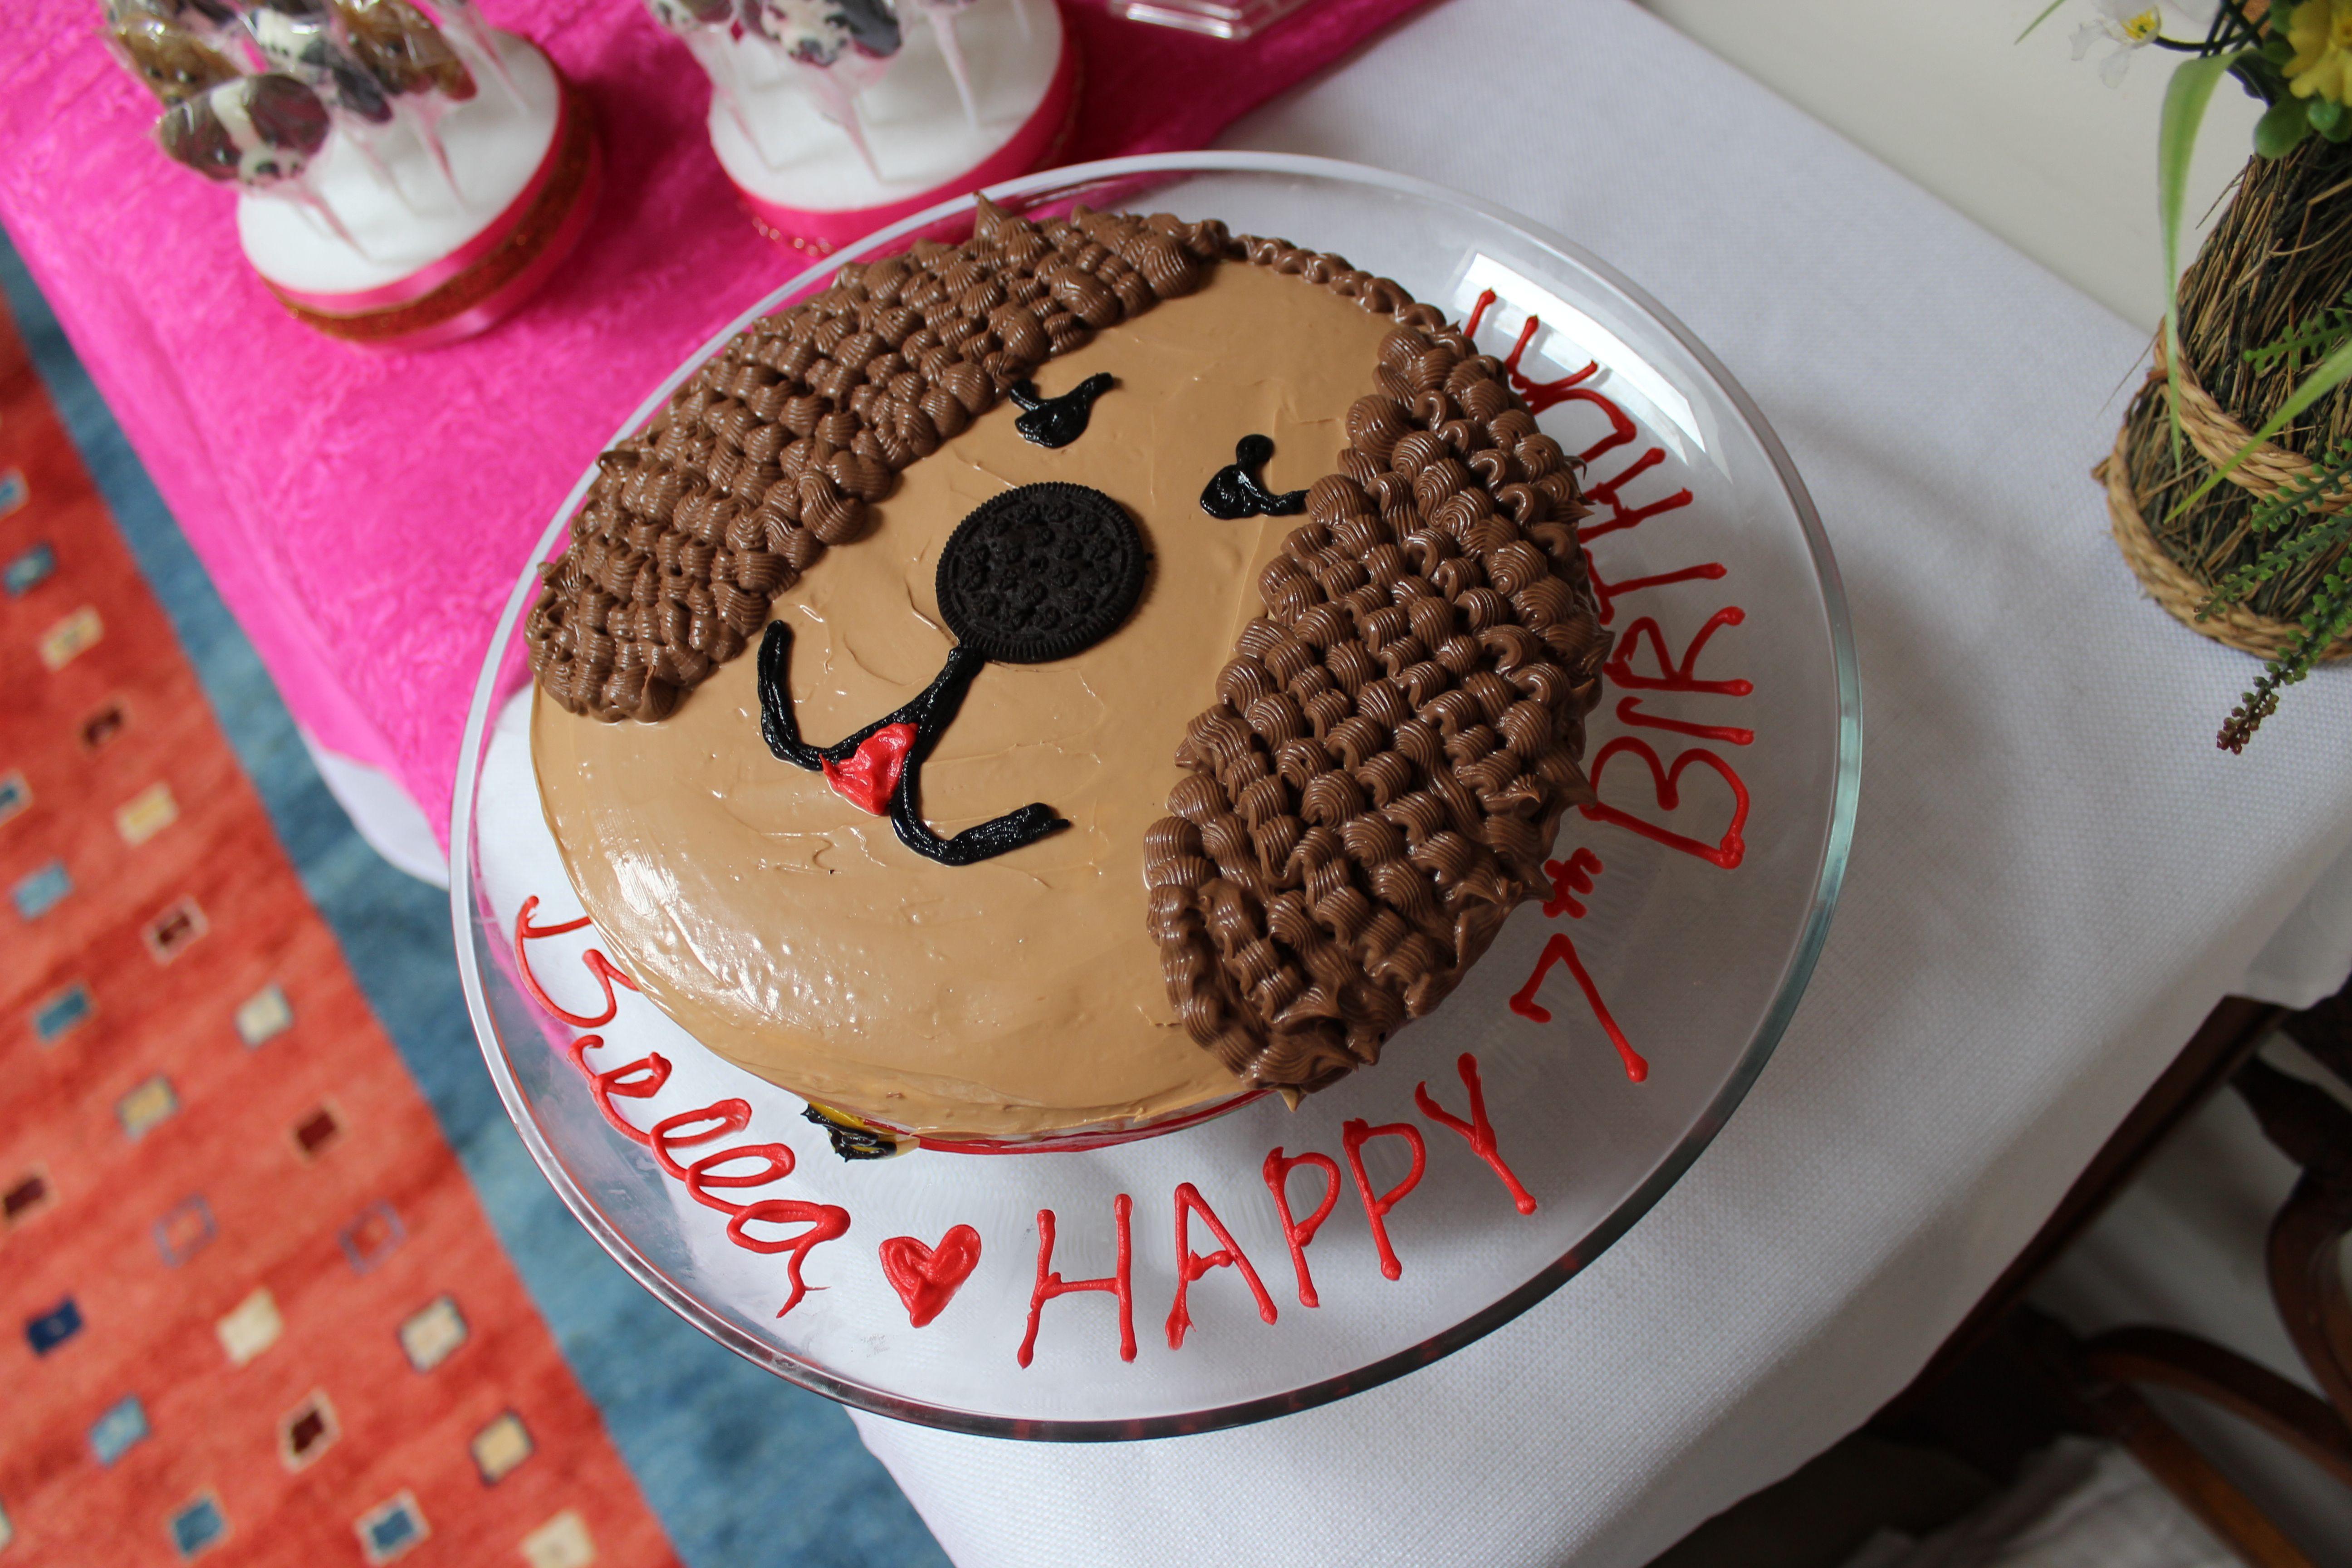 Puppy cake party ideas pinterest puppy cake cake and birthdays